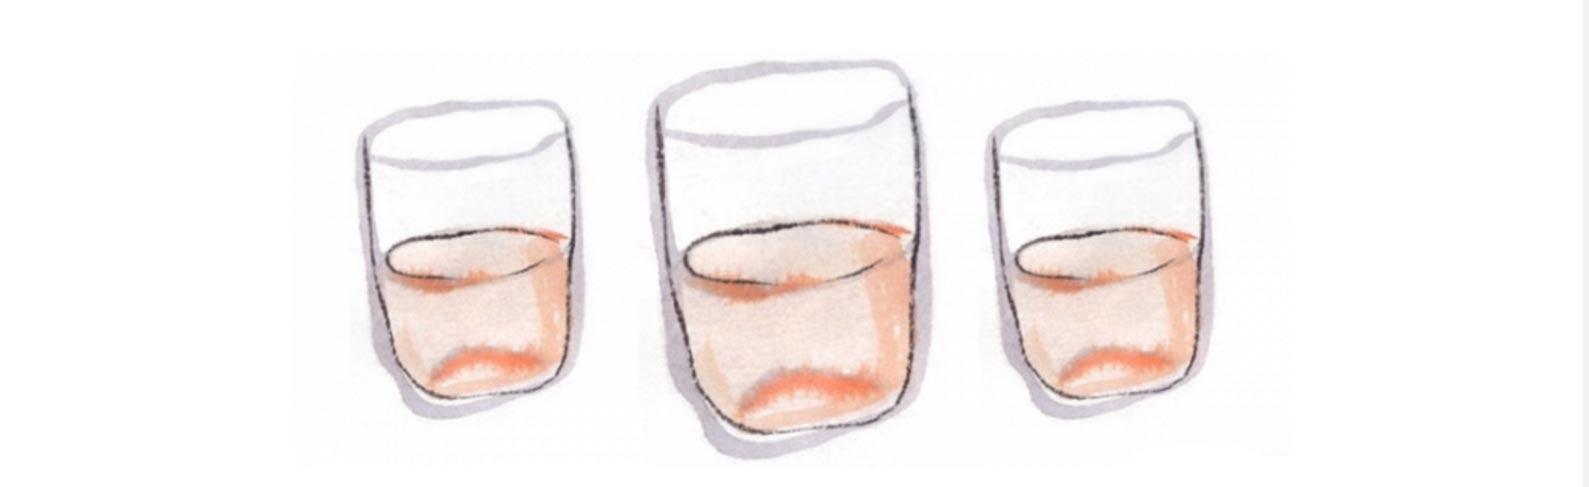 O copo e a flecha